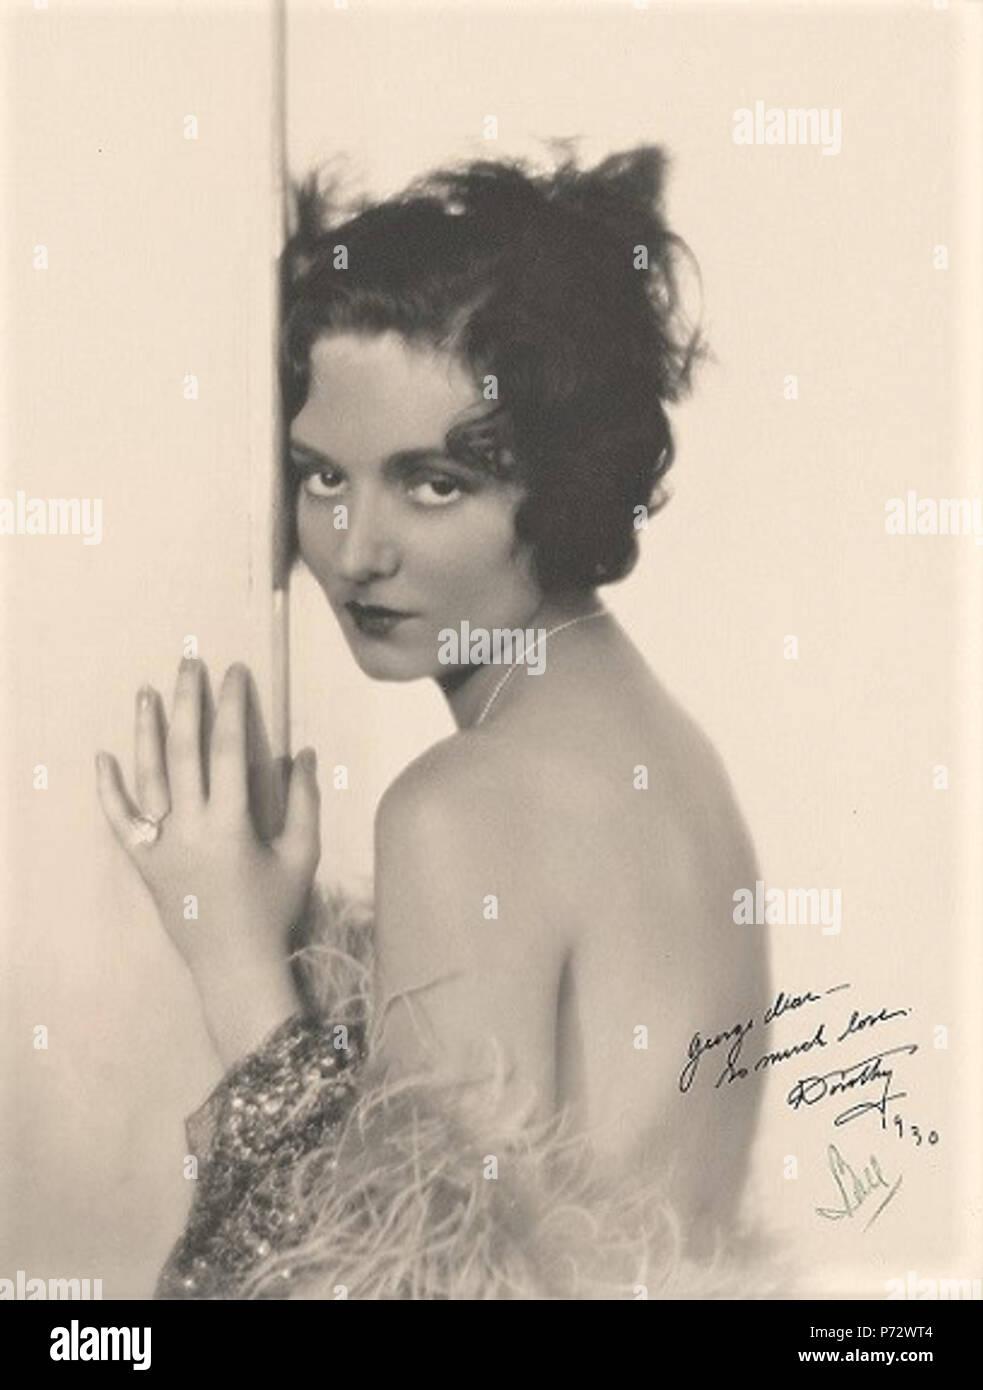 images Dorothy Bramhall